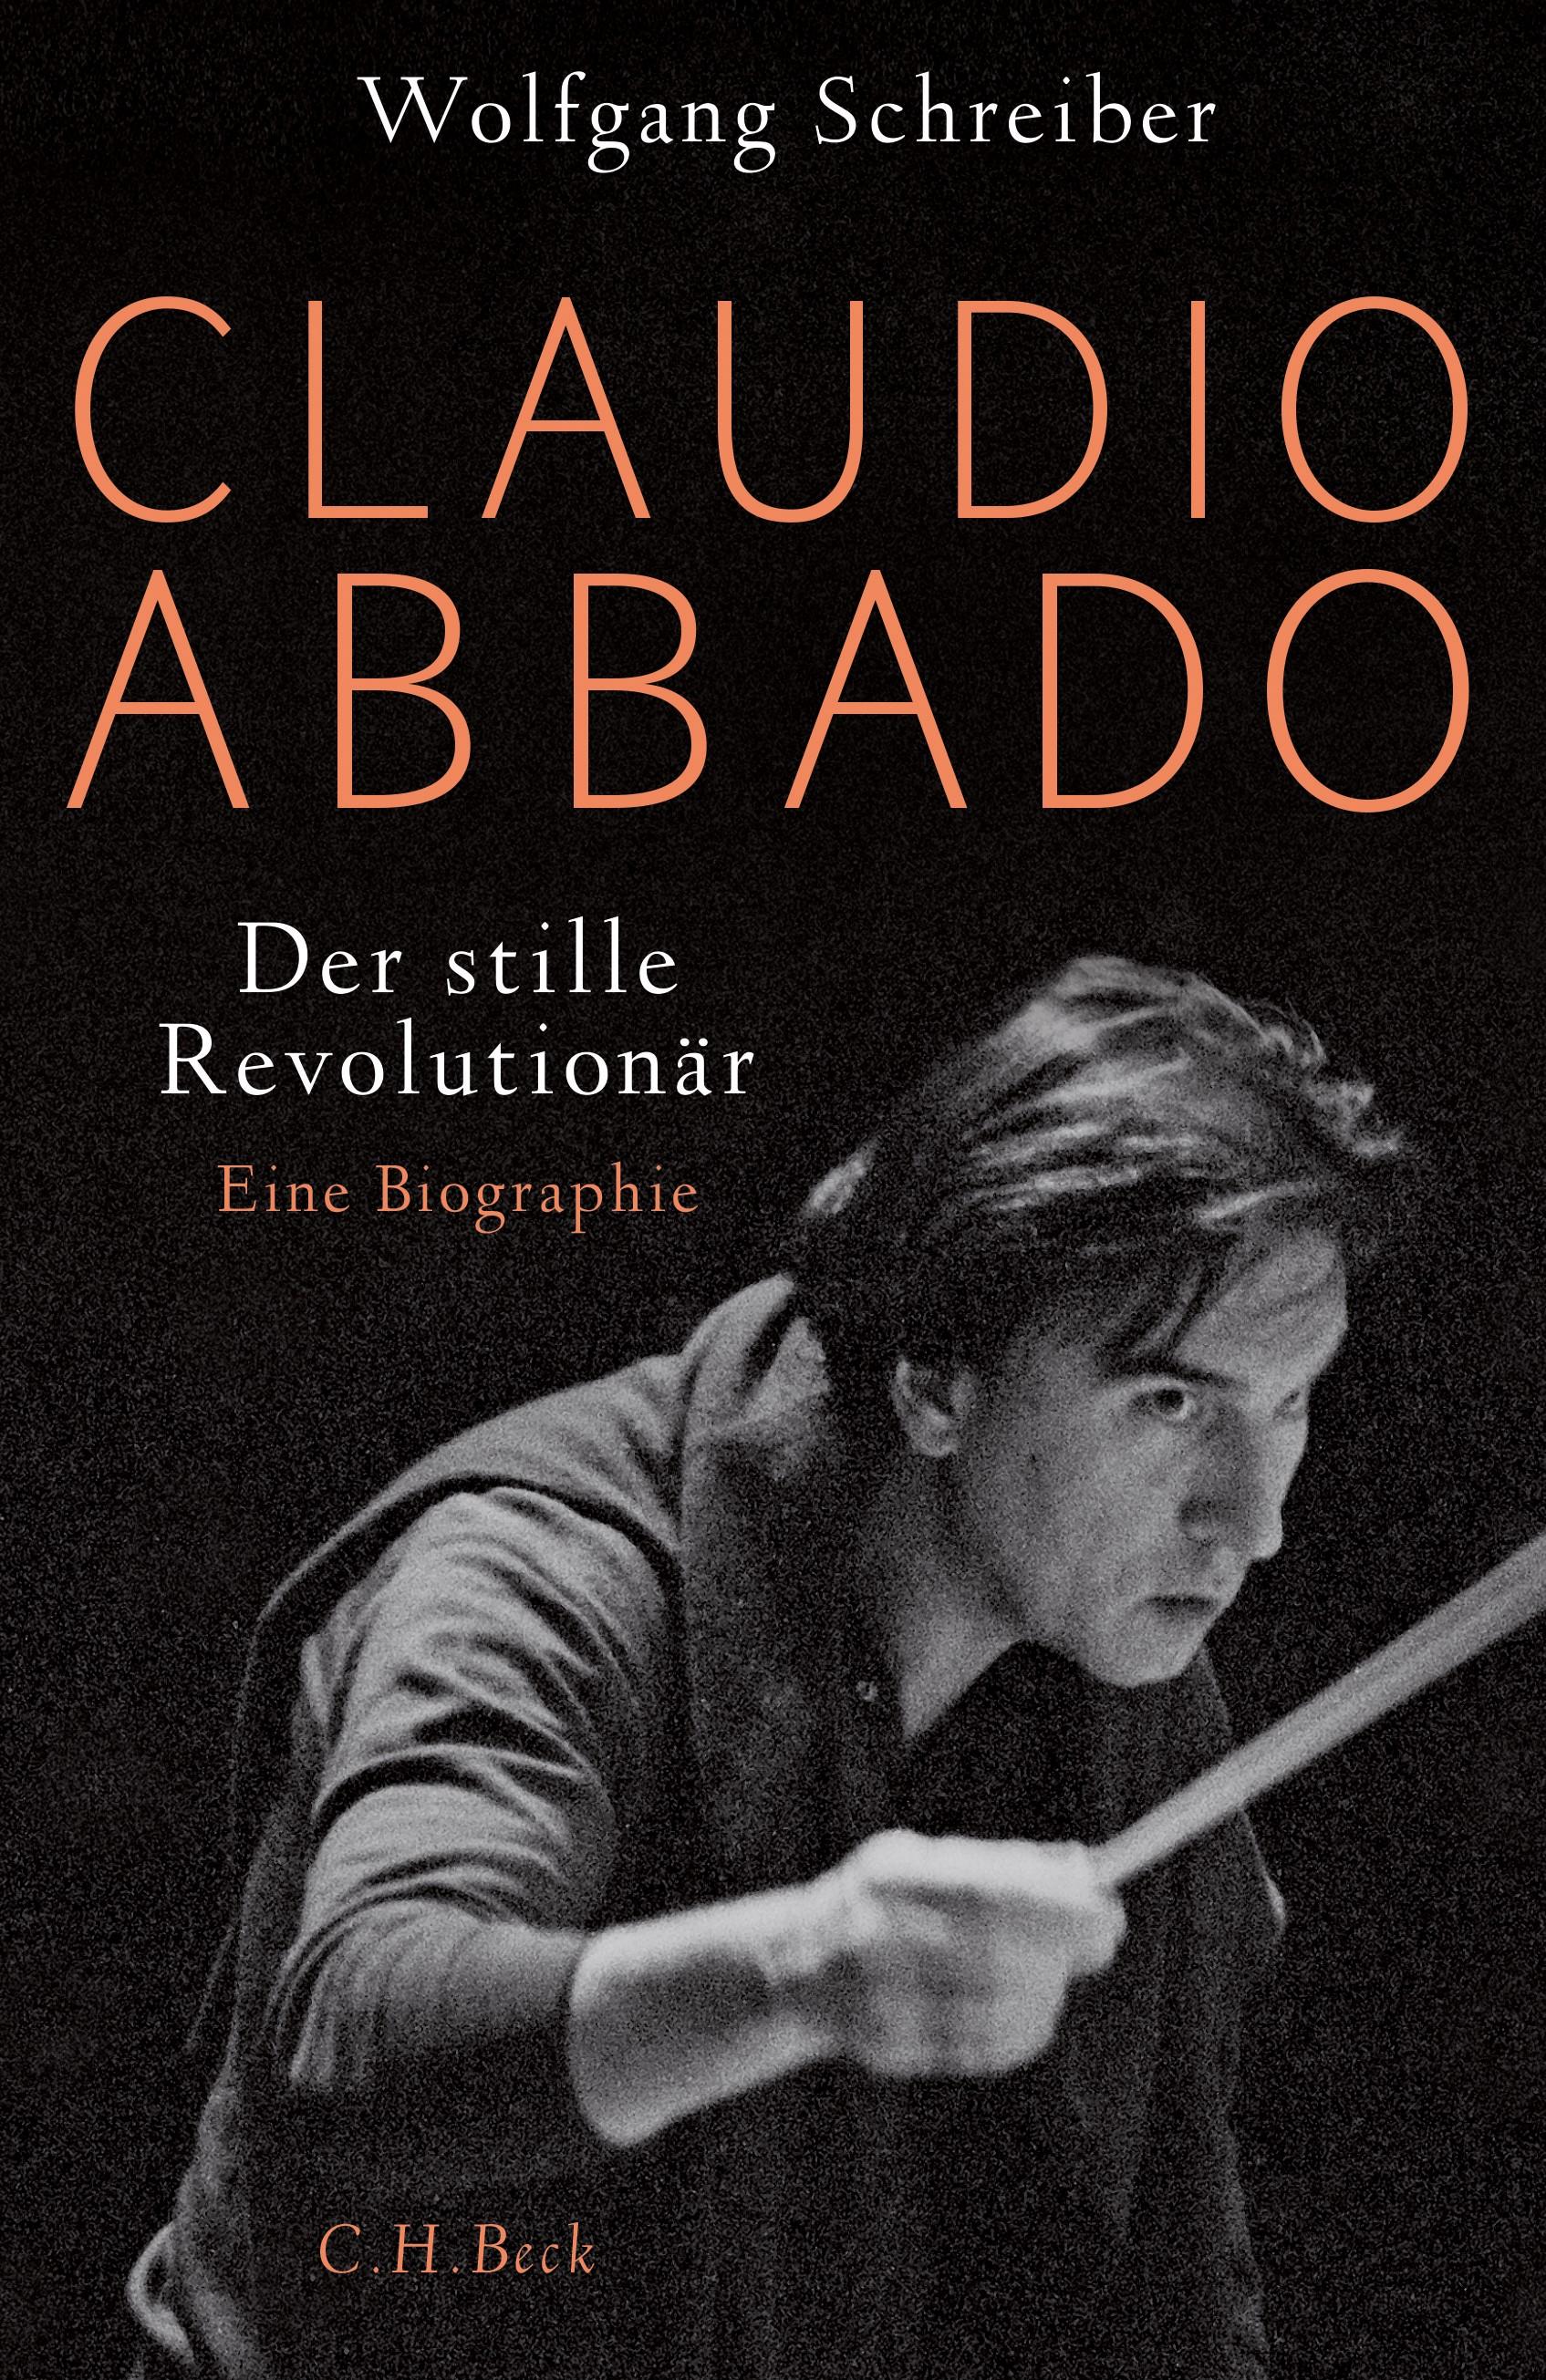 Claudio Abbado   Schreiber, Wolfgang, 2019   Buch (Cover)